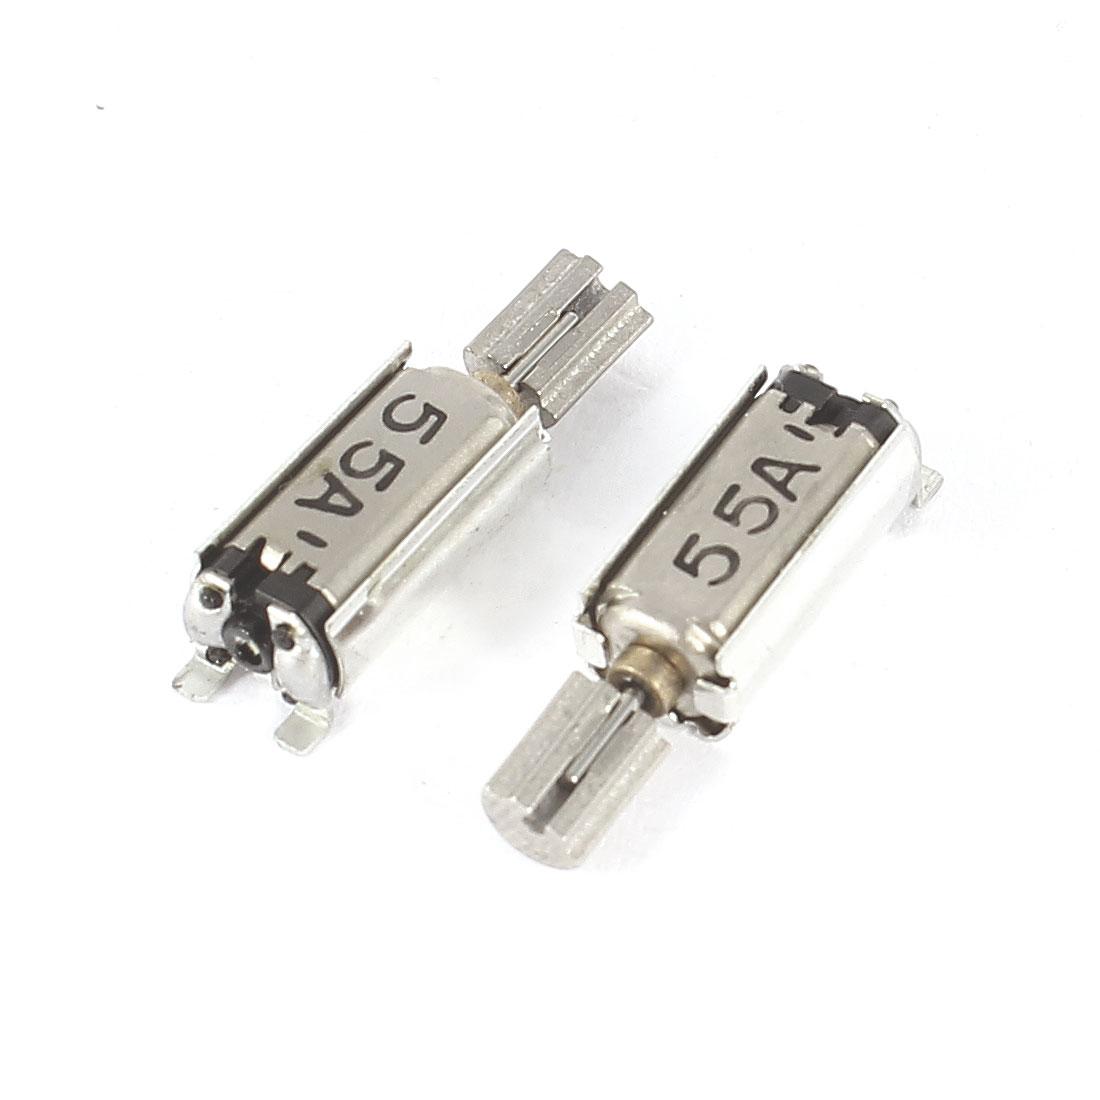 2-Pieces-15000-20000PRM-Micro-Vibrating-Vibration-Motor-DC-1-5-3V-0-04-0-09A